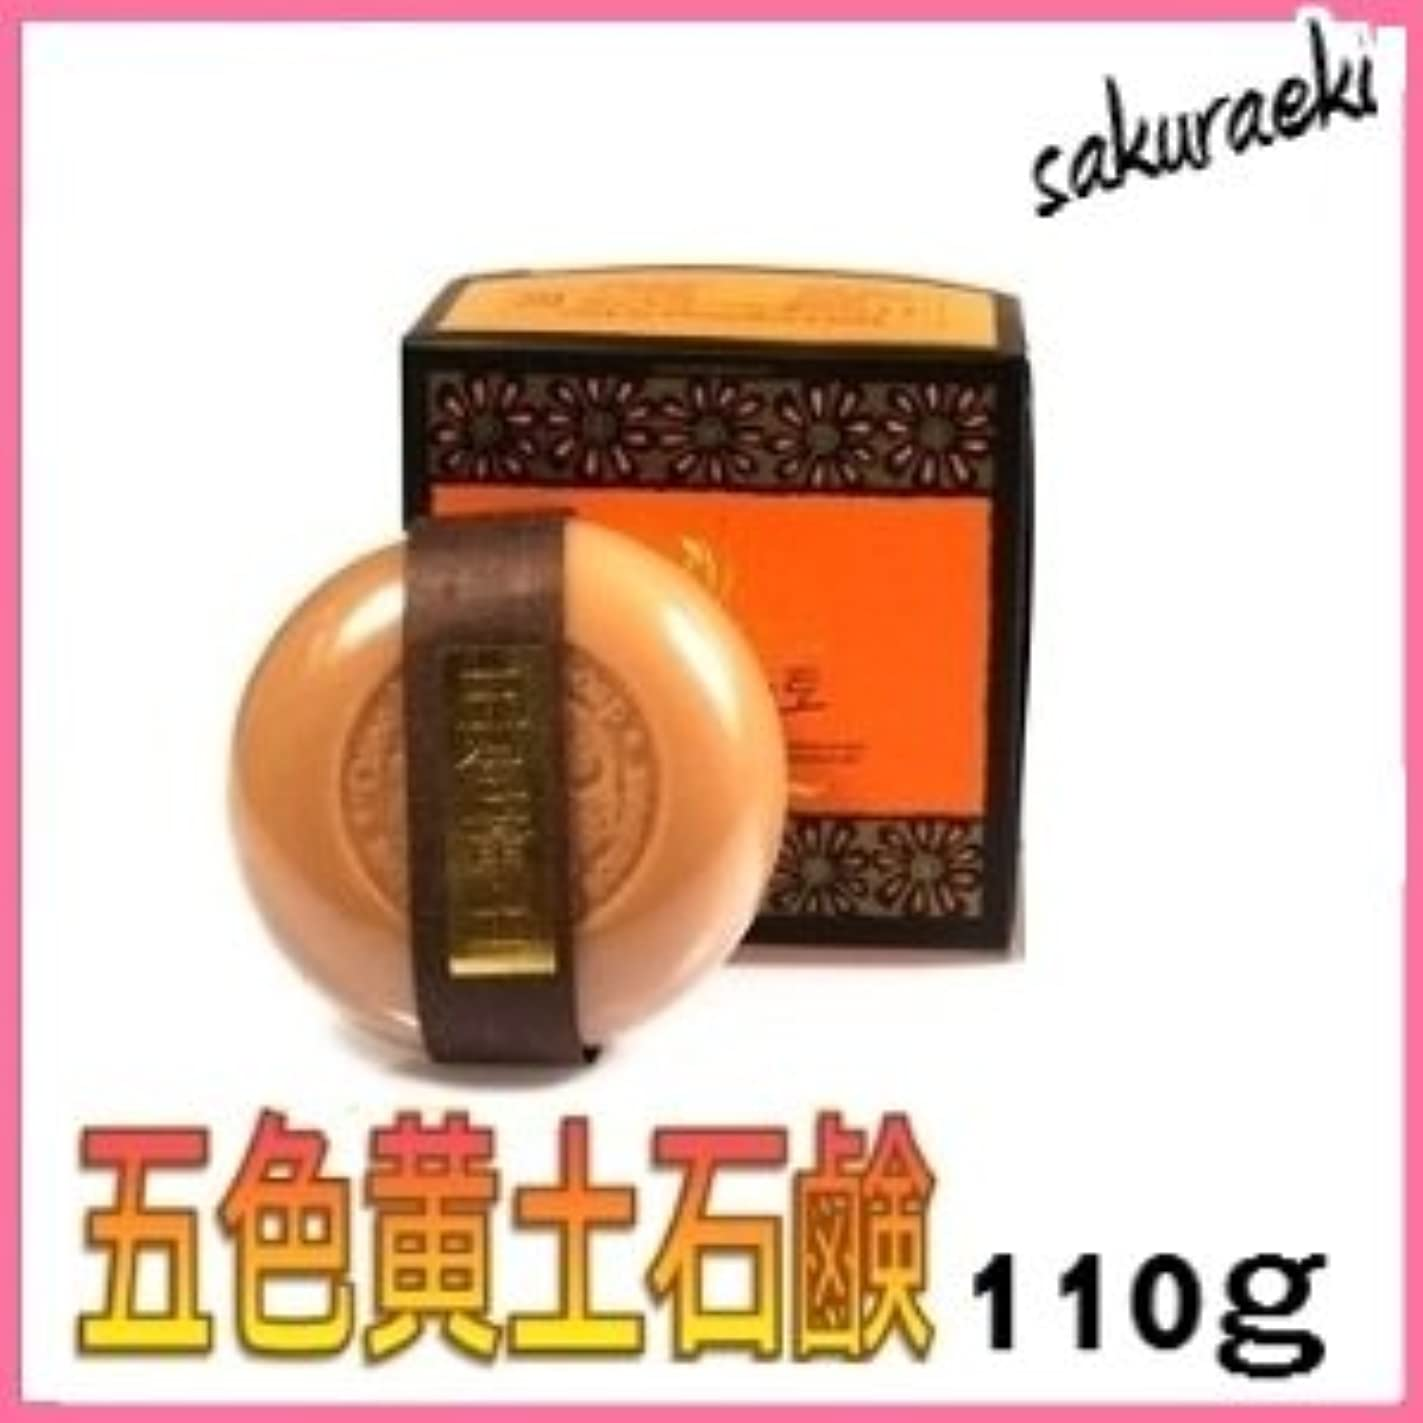 韓国 天然五色 黄土石鹸 110g【韓国コスメ】